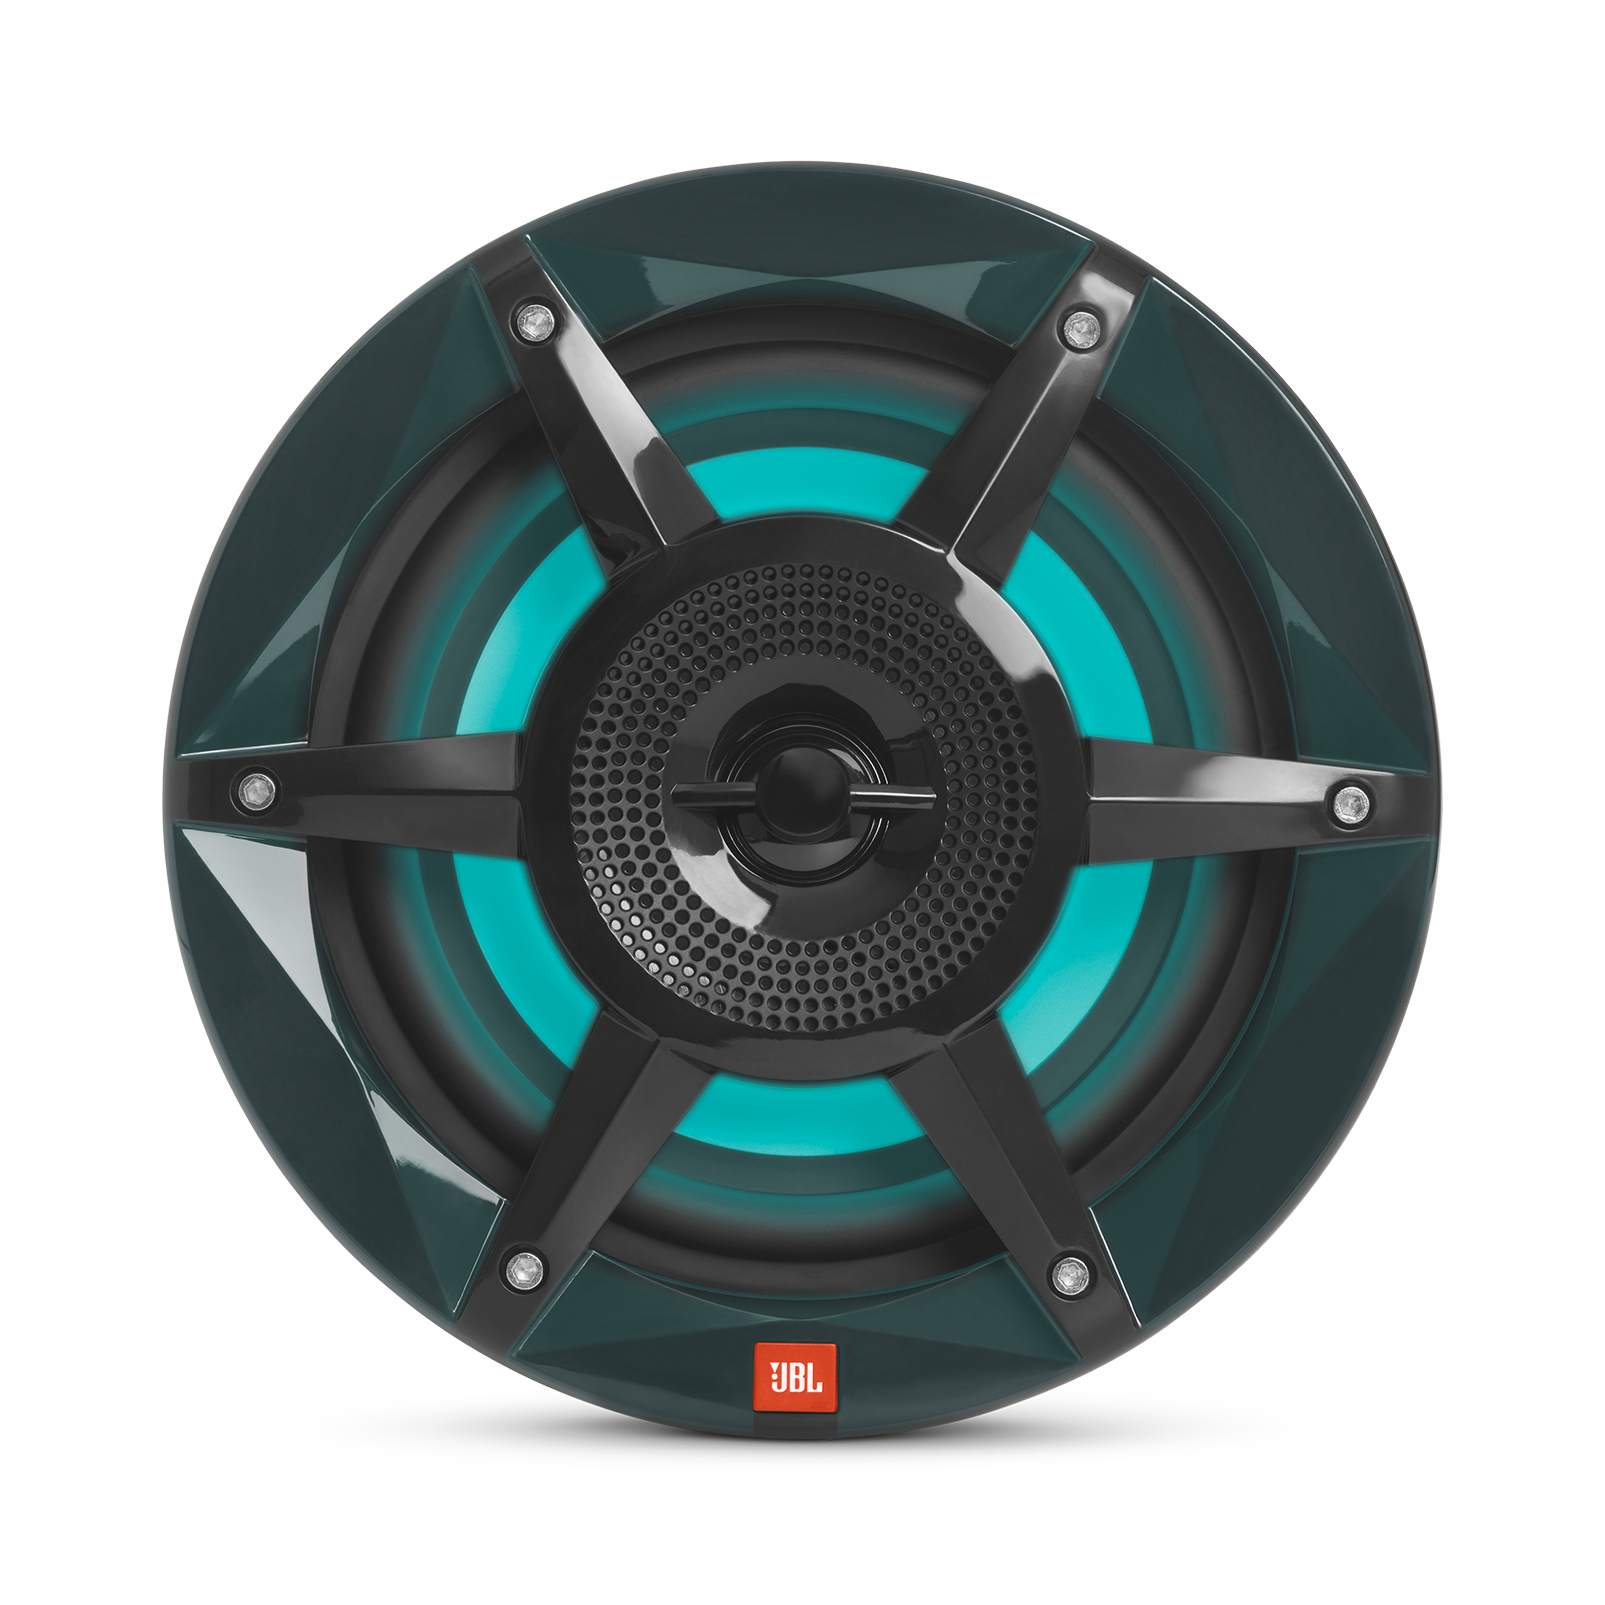 JBL Stadium Marine M6520 - Black - Take JBL concert level sound to the high seas. - Detailshot 1